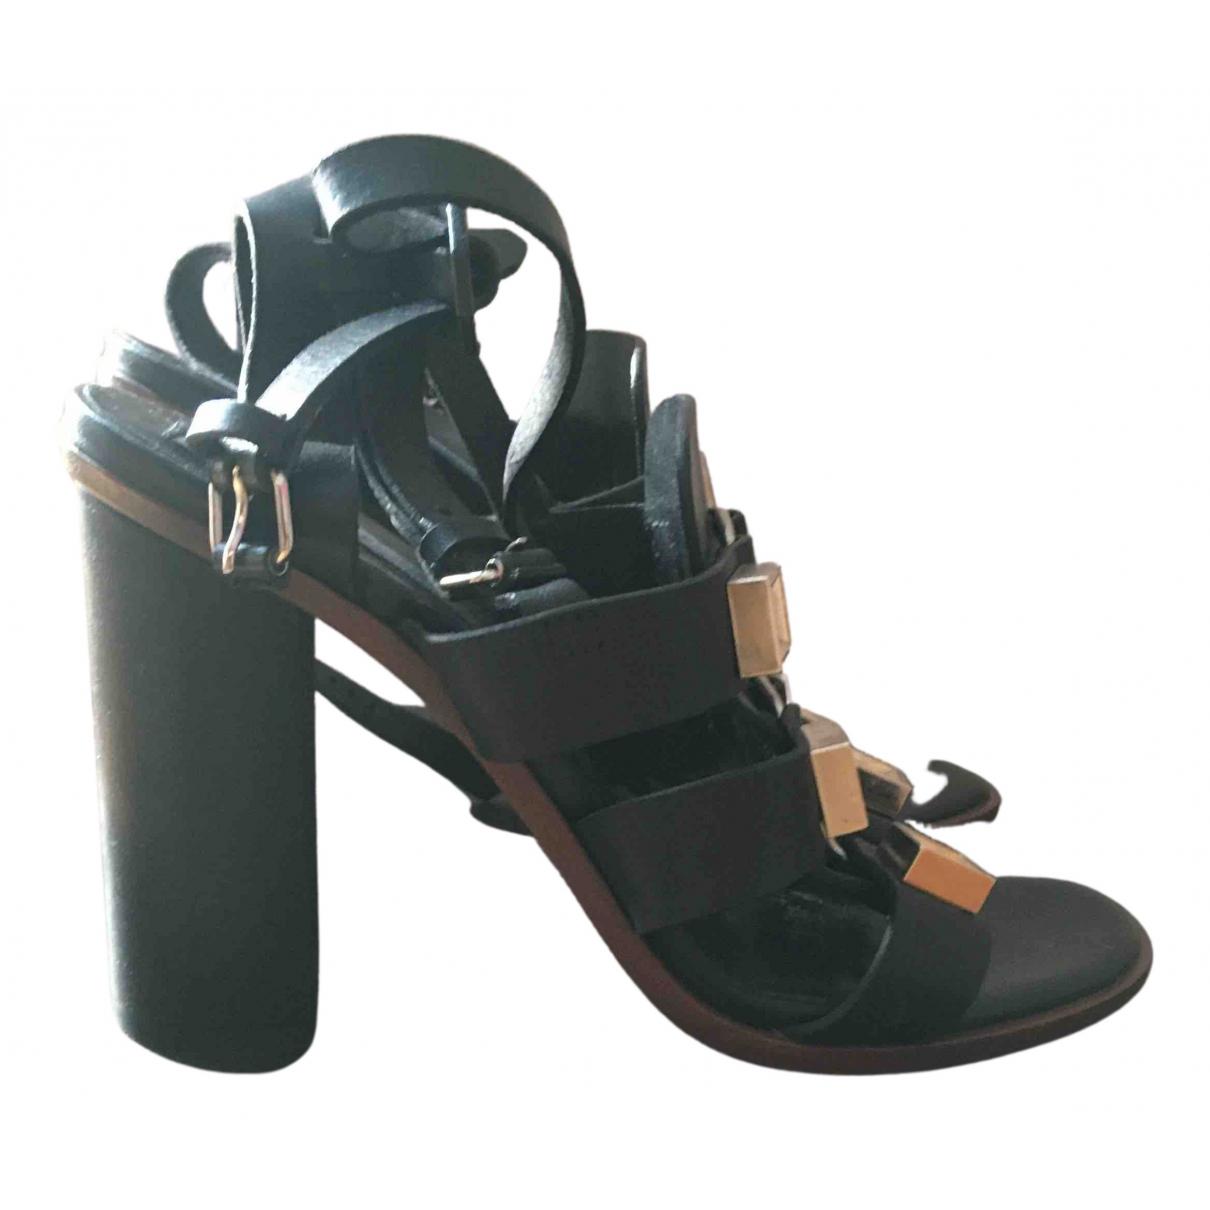 Proenza Schouler N Black Leather Sandals for Women 37 EU